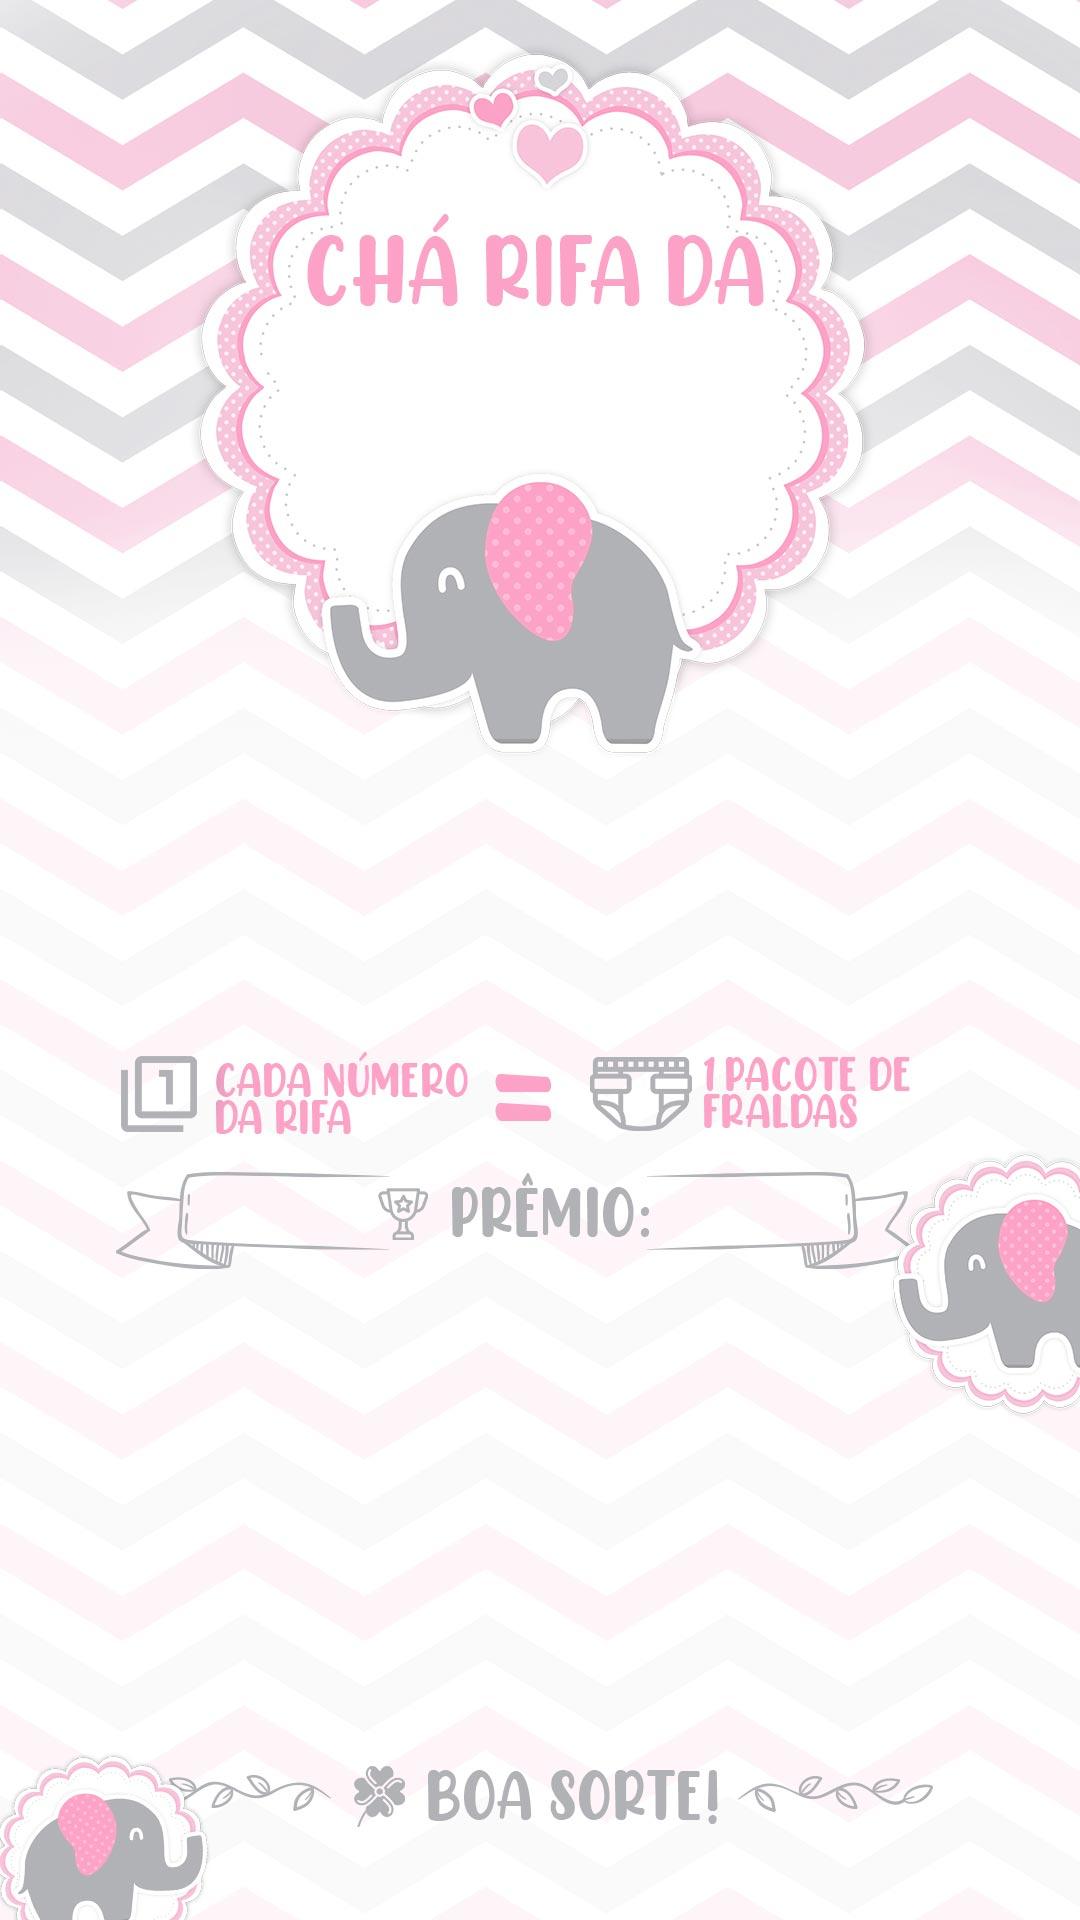 Convite Rifa Elefantinho rosa 222